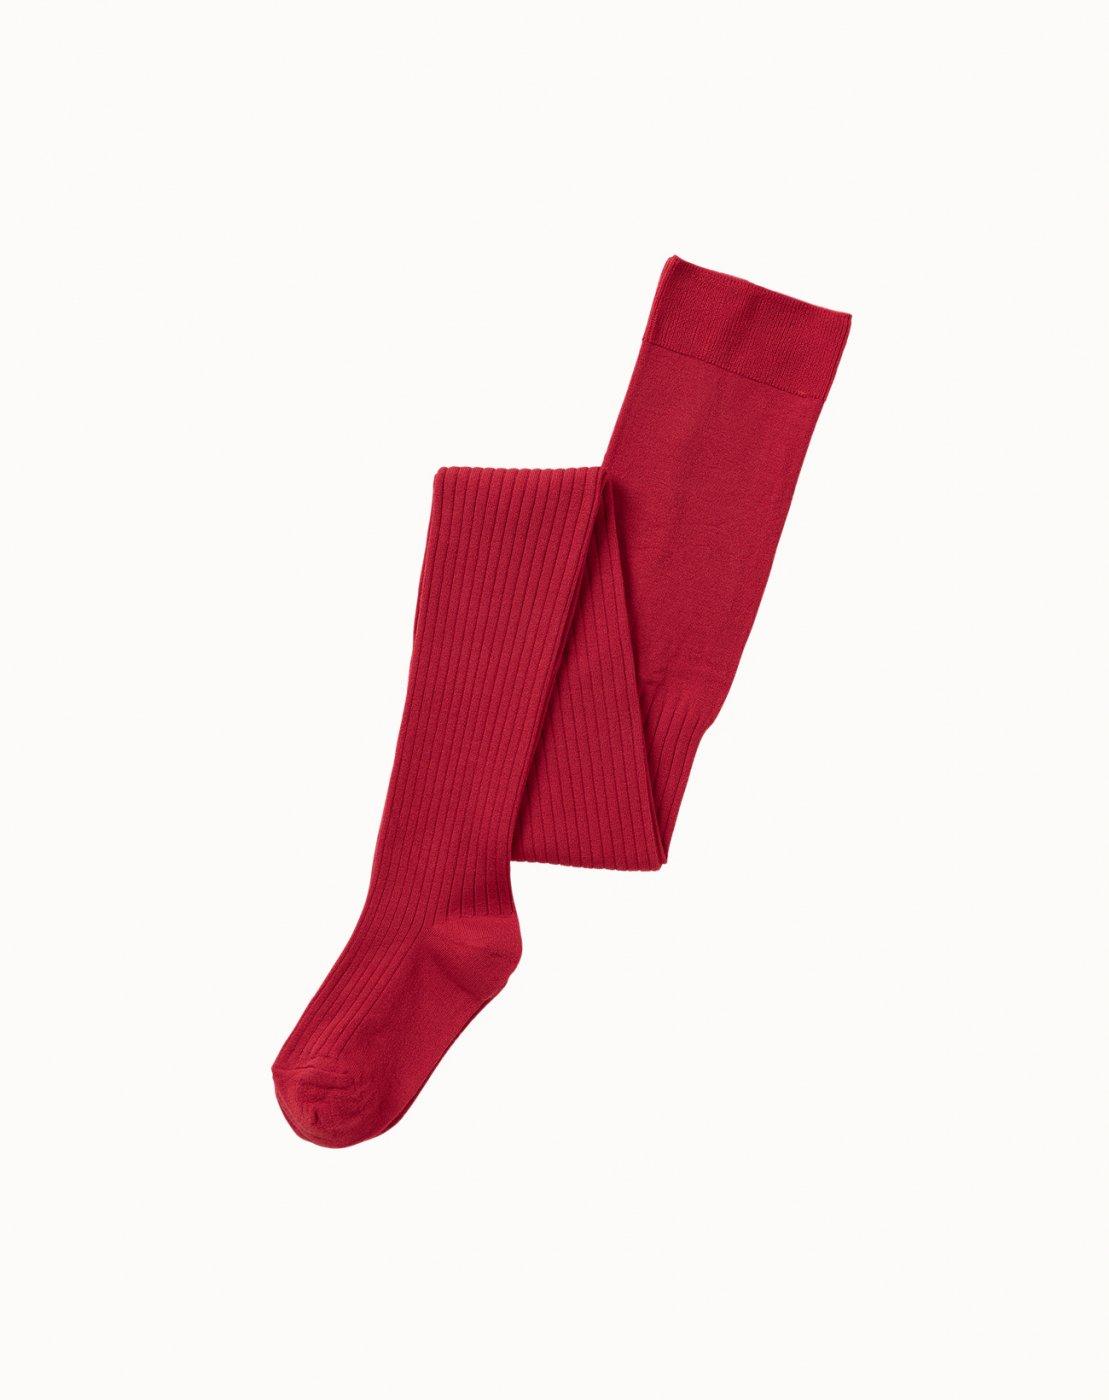 leur logette - Silk Rib Tights - Red